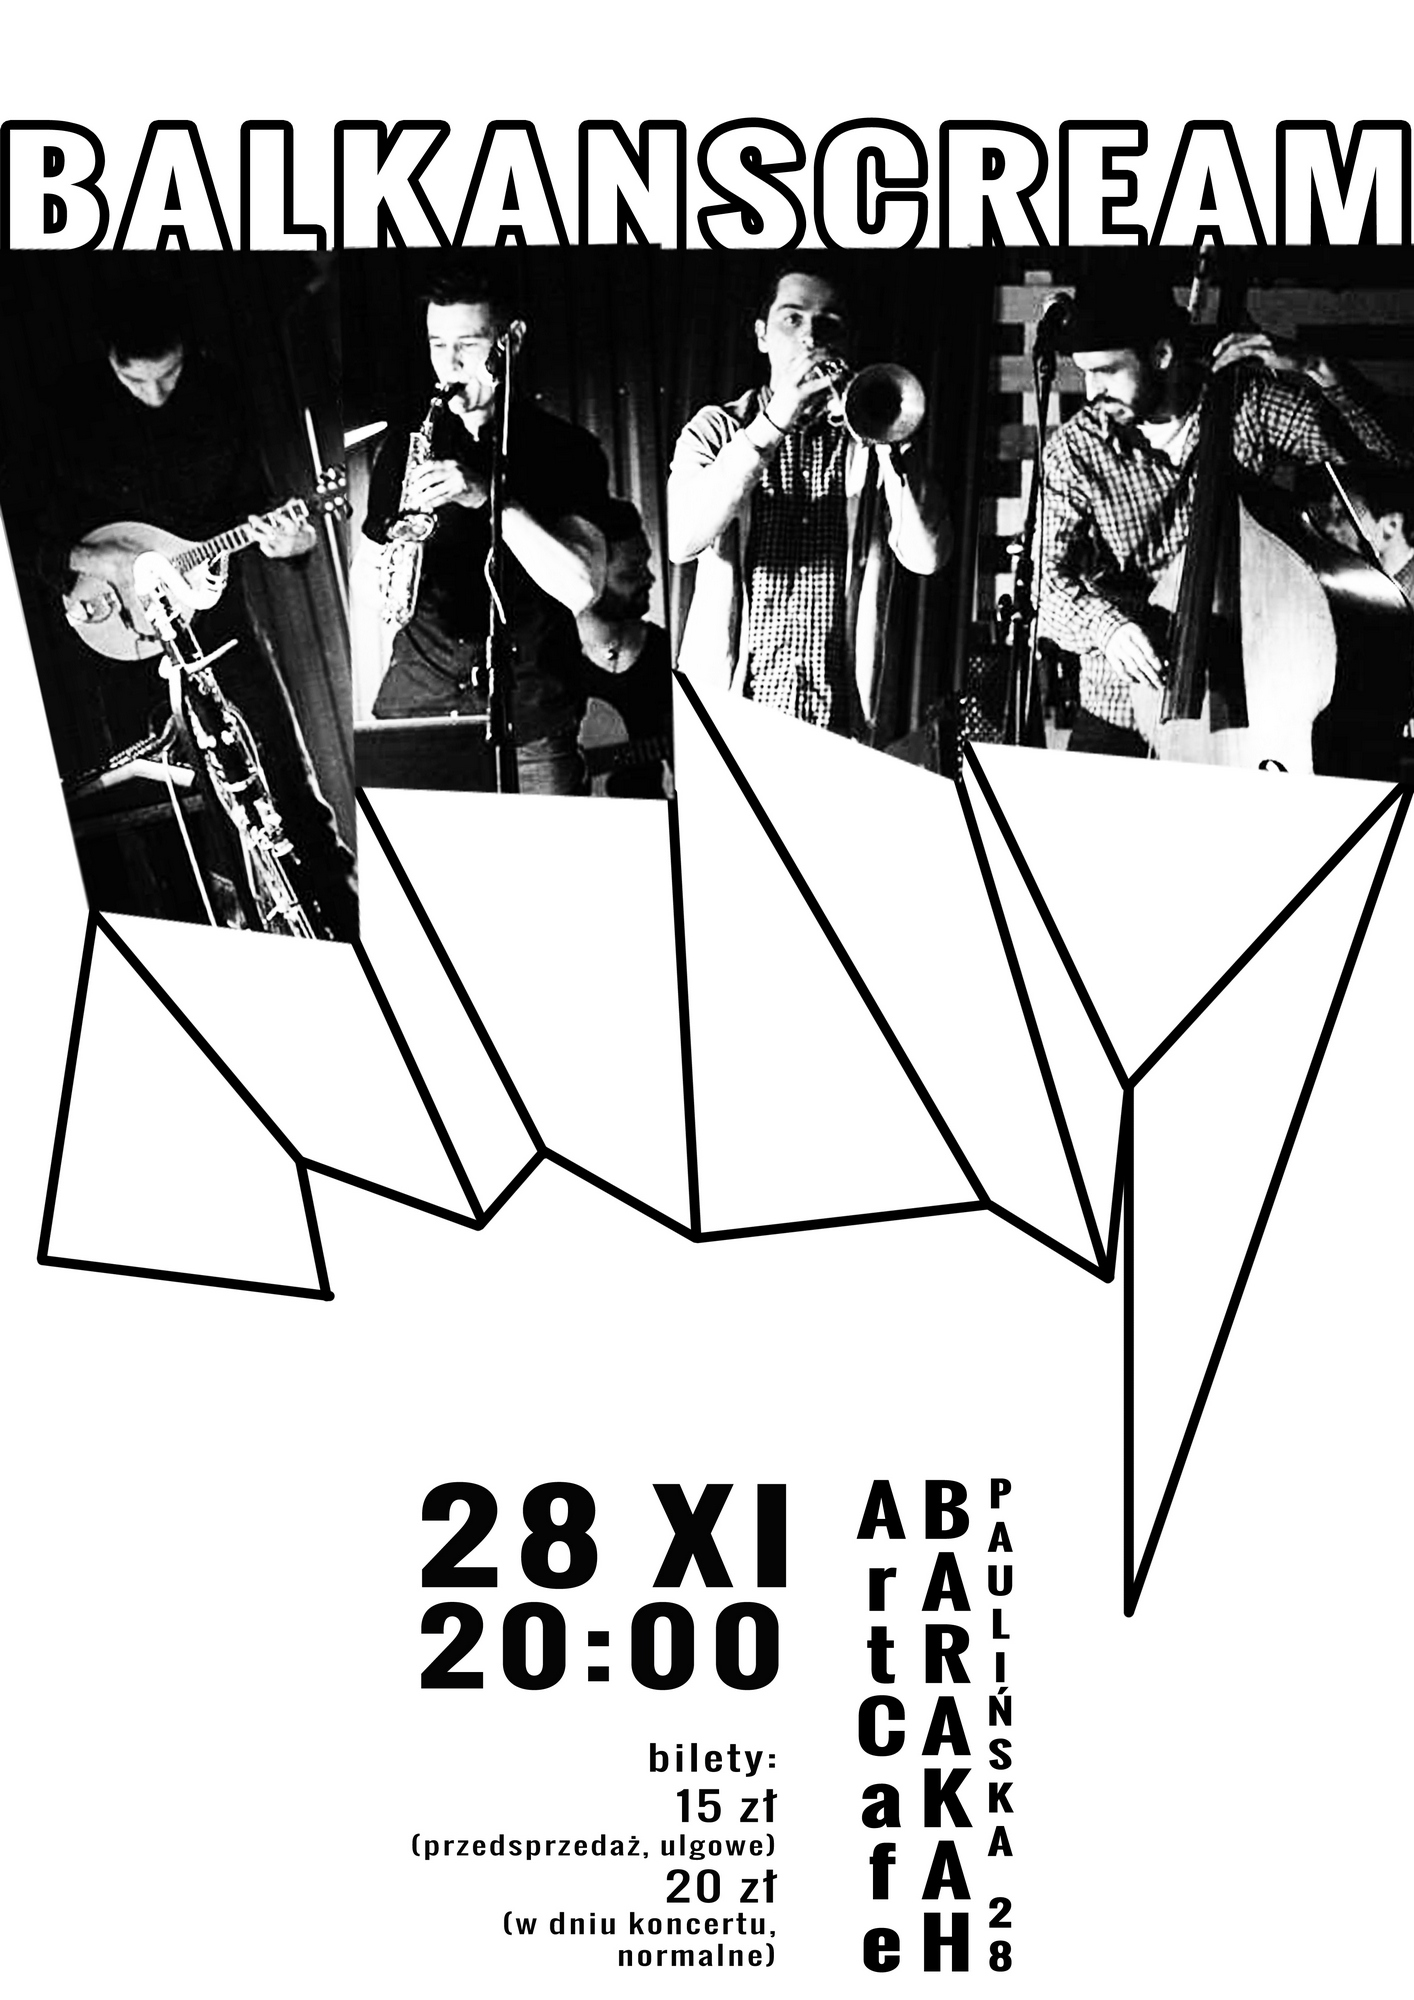 Balkanscream w Teatrze Barakah − plakat (źródło: materiały prasowe organizatora)